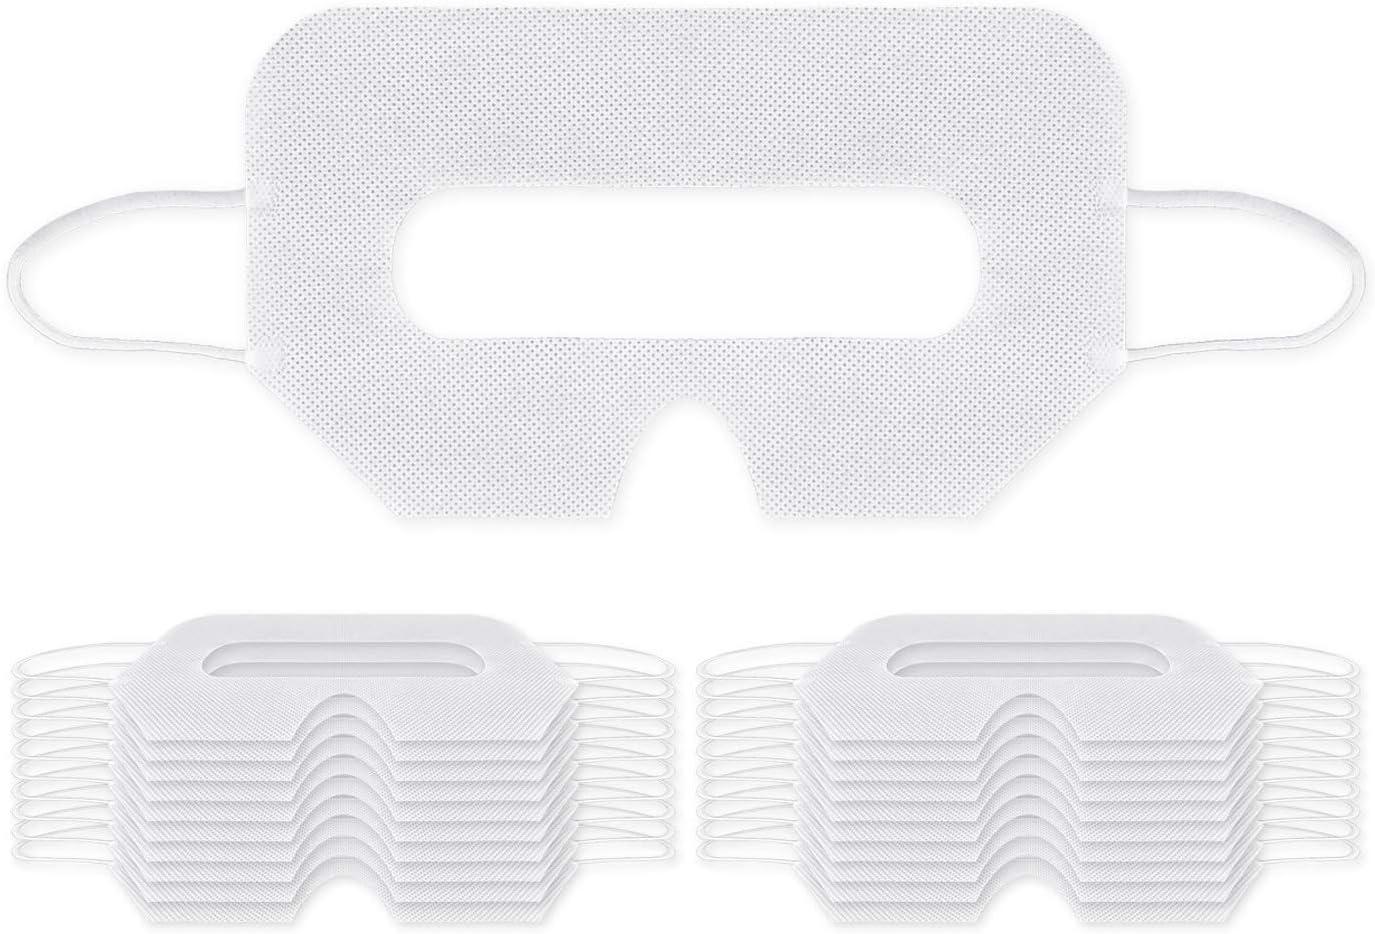 SCSpecial 20 piezas Universal VR Desechable Higiene Mascarilla para la cara Cubierta de cara Compatible con HTC VIVE PSVR Playstation VR Oculus Rift